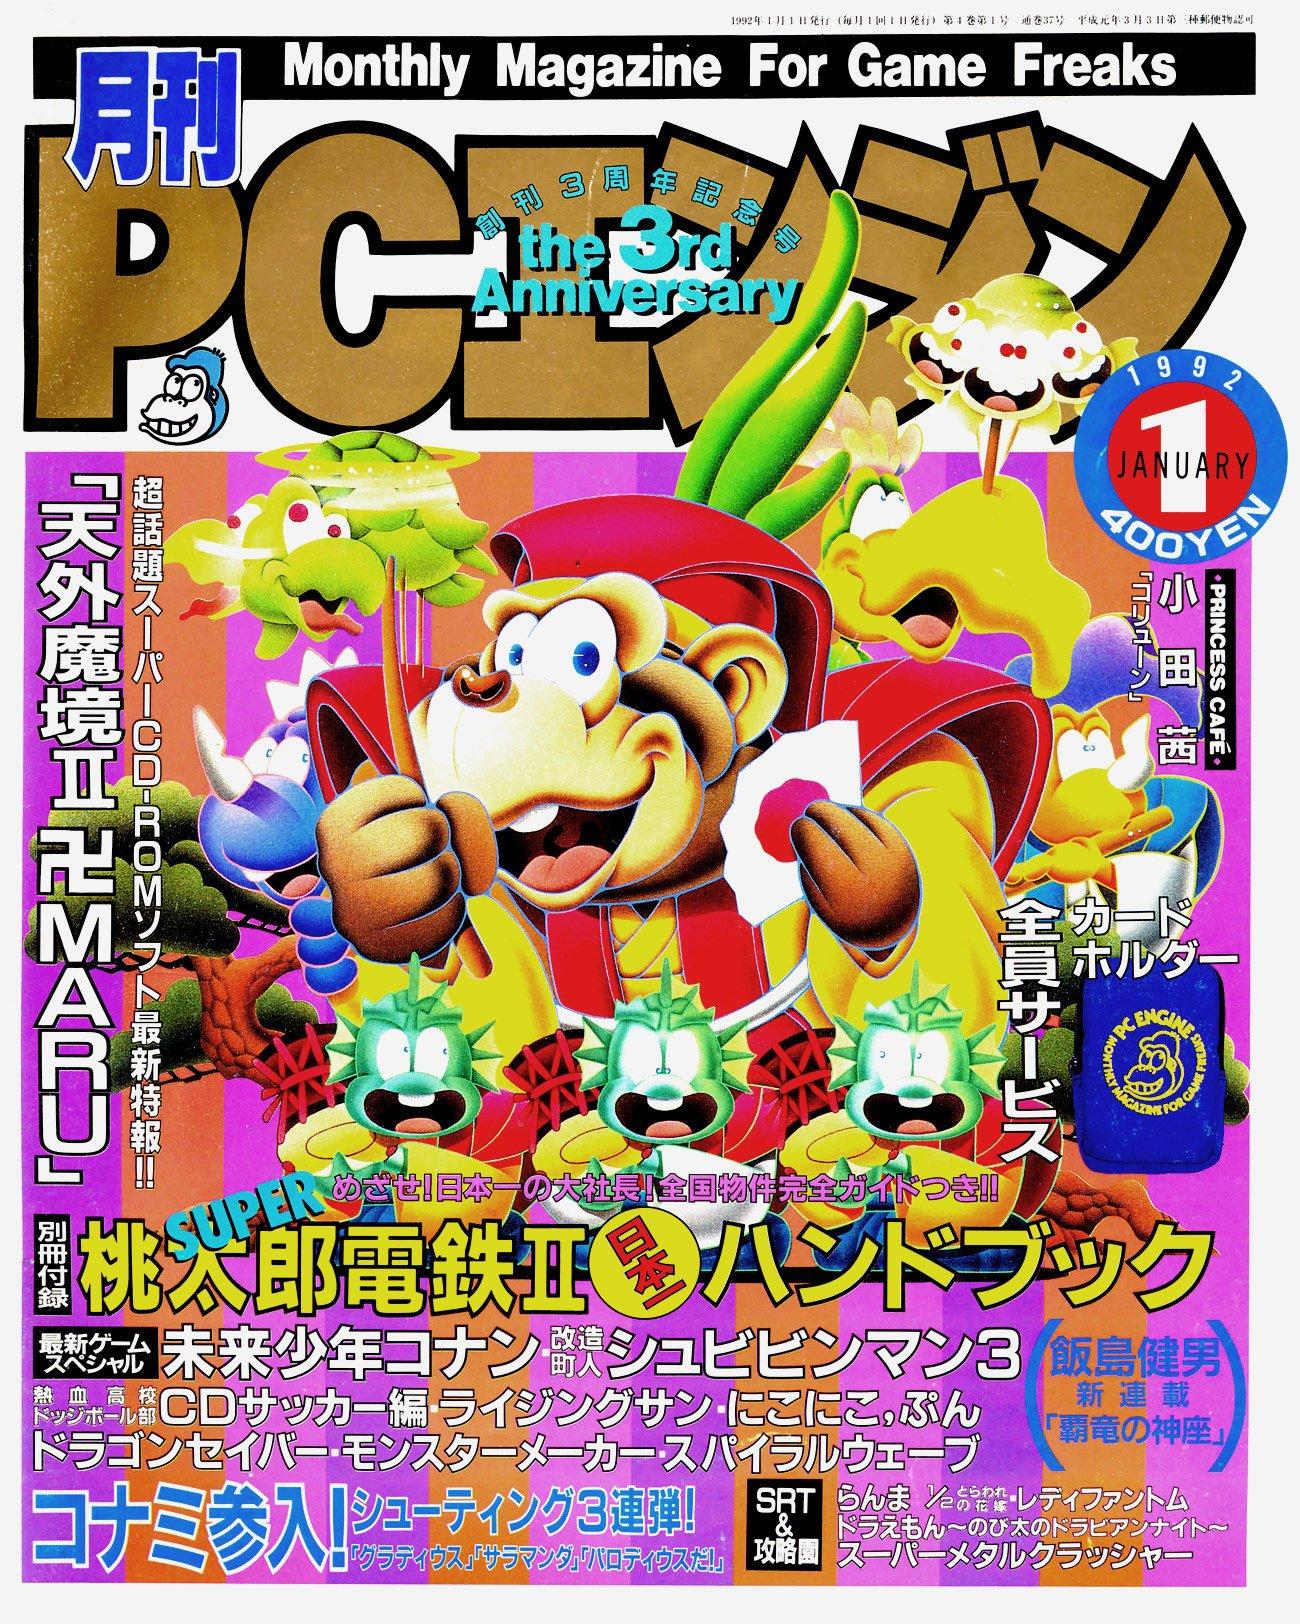 Gekkan PC Engine Issue 37 (January 1992)